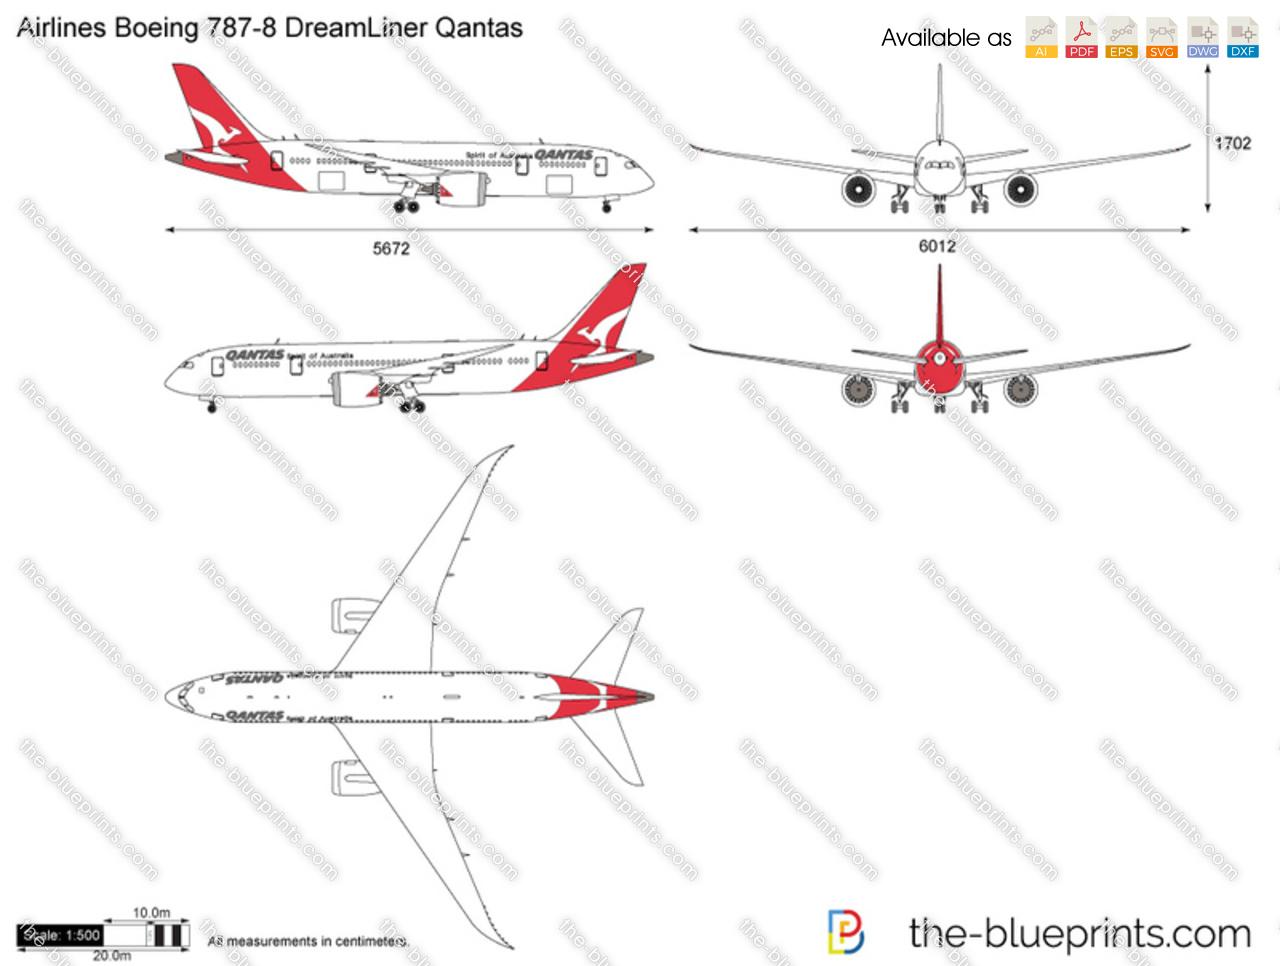 Boeing 787-8 DreamLiner Qantas